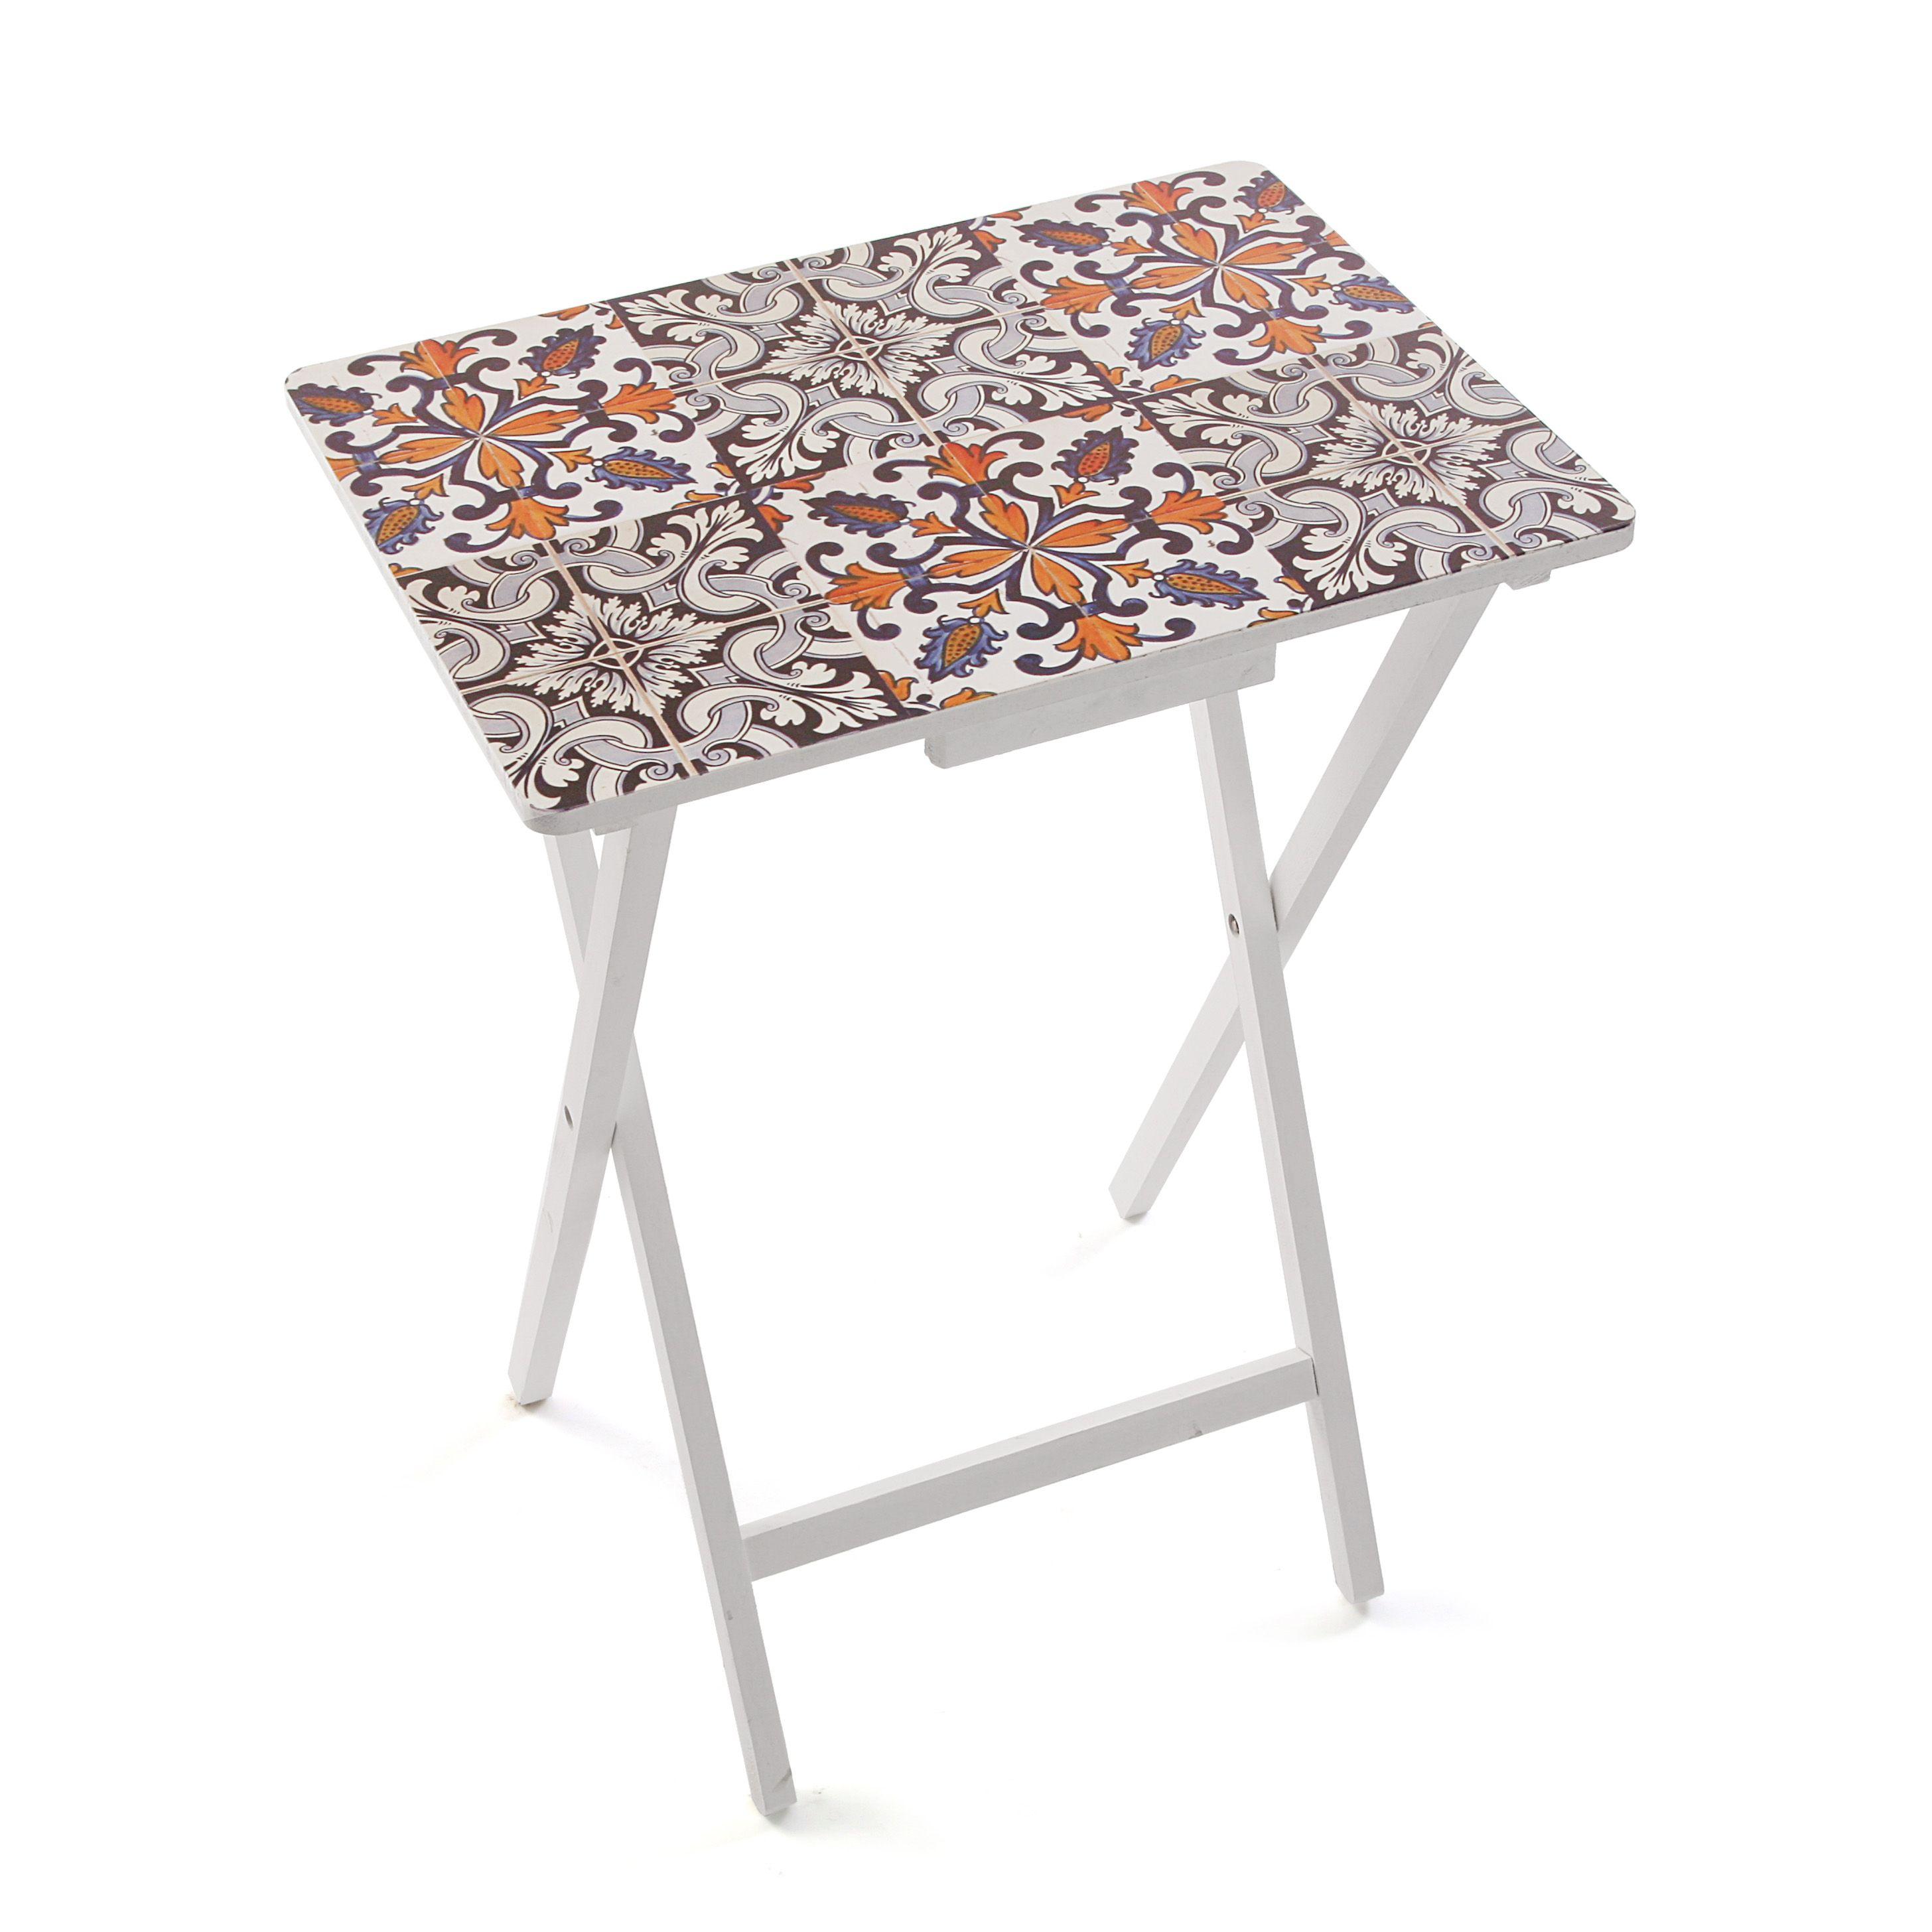 mesa plegable con estampado de baldosa mesa baldosa casa versa foldable